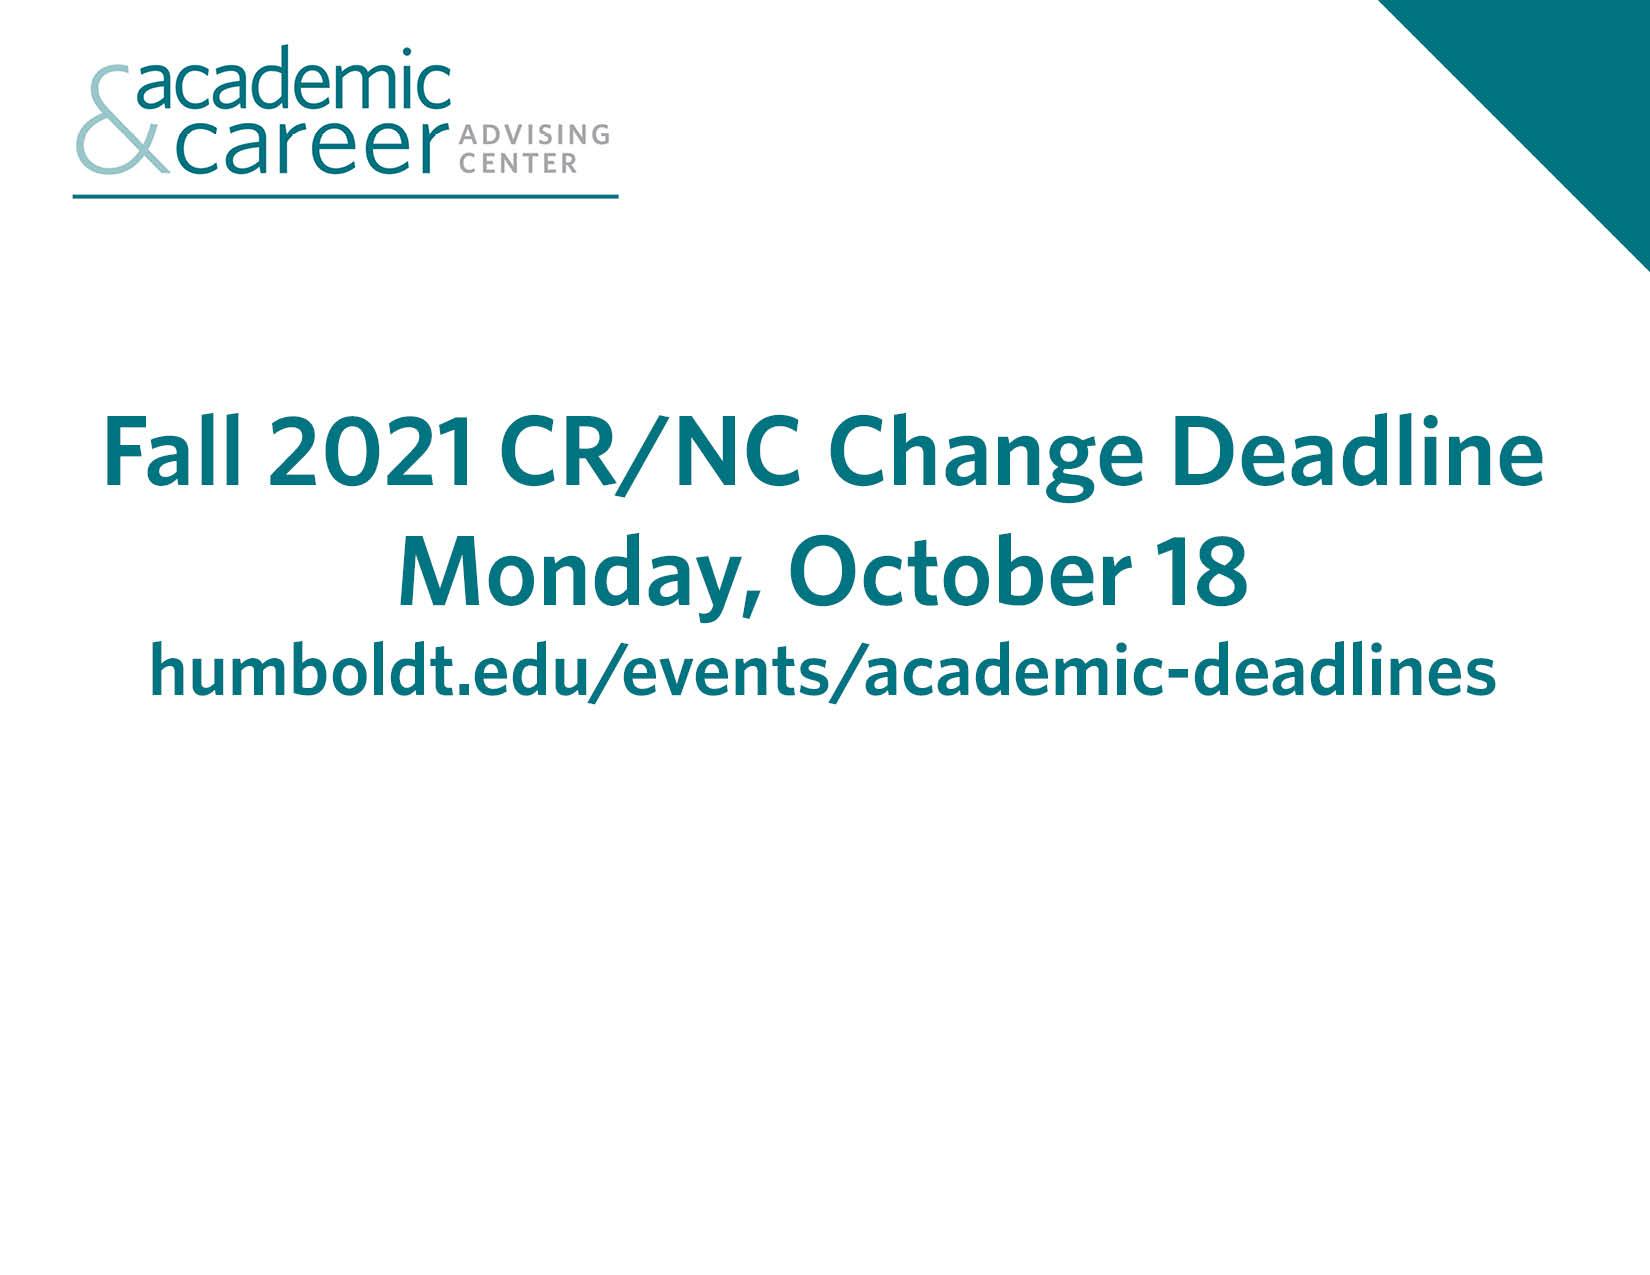 credit no credit change deadline monday october 18